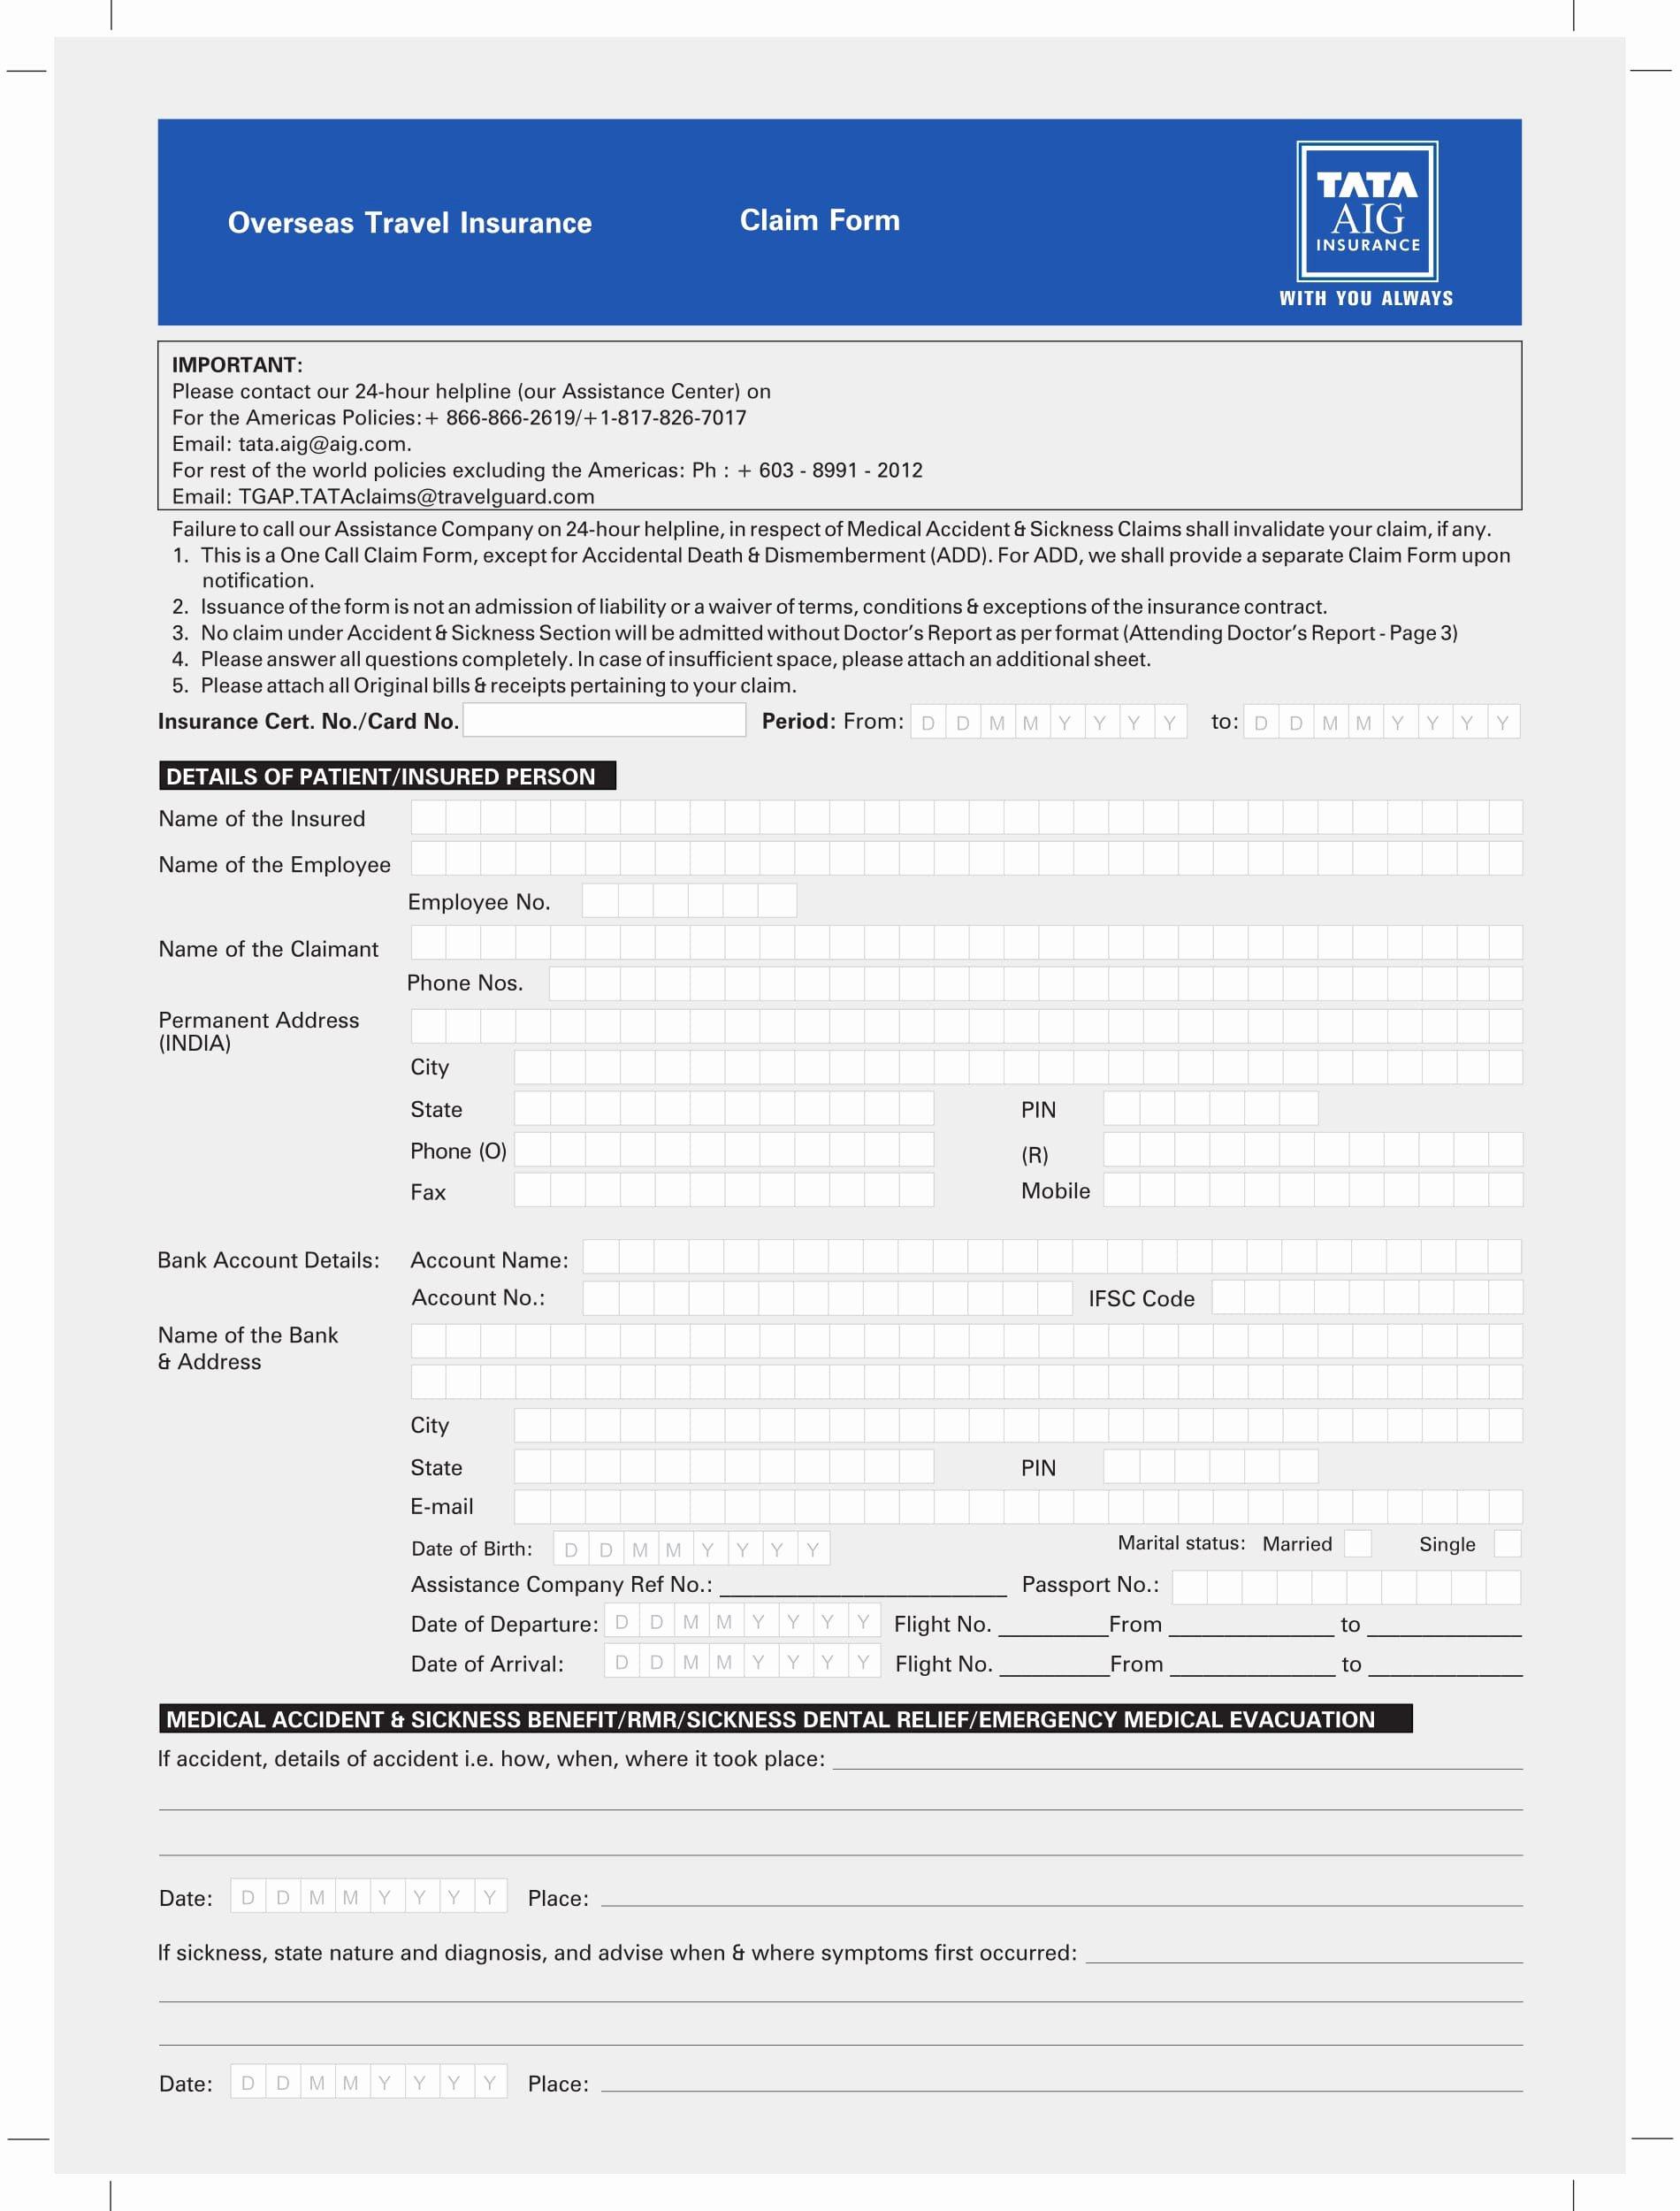 Travel Claim form Beautiful 10 Travel forms Travel Proposal Registration form